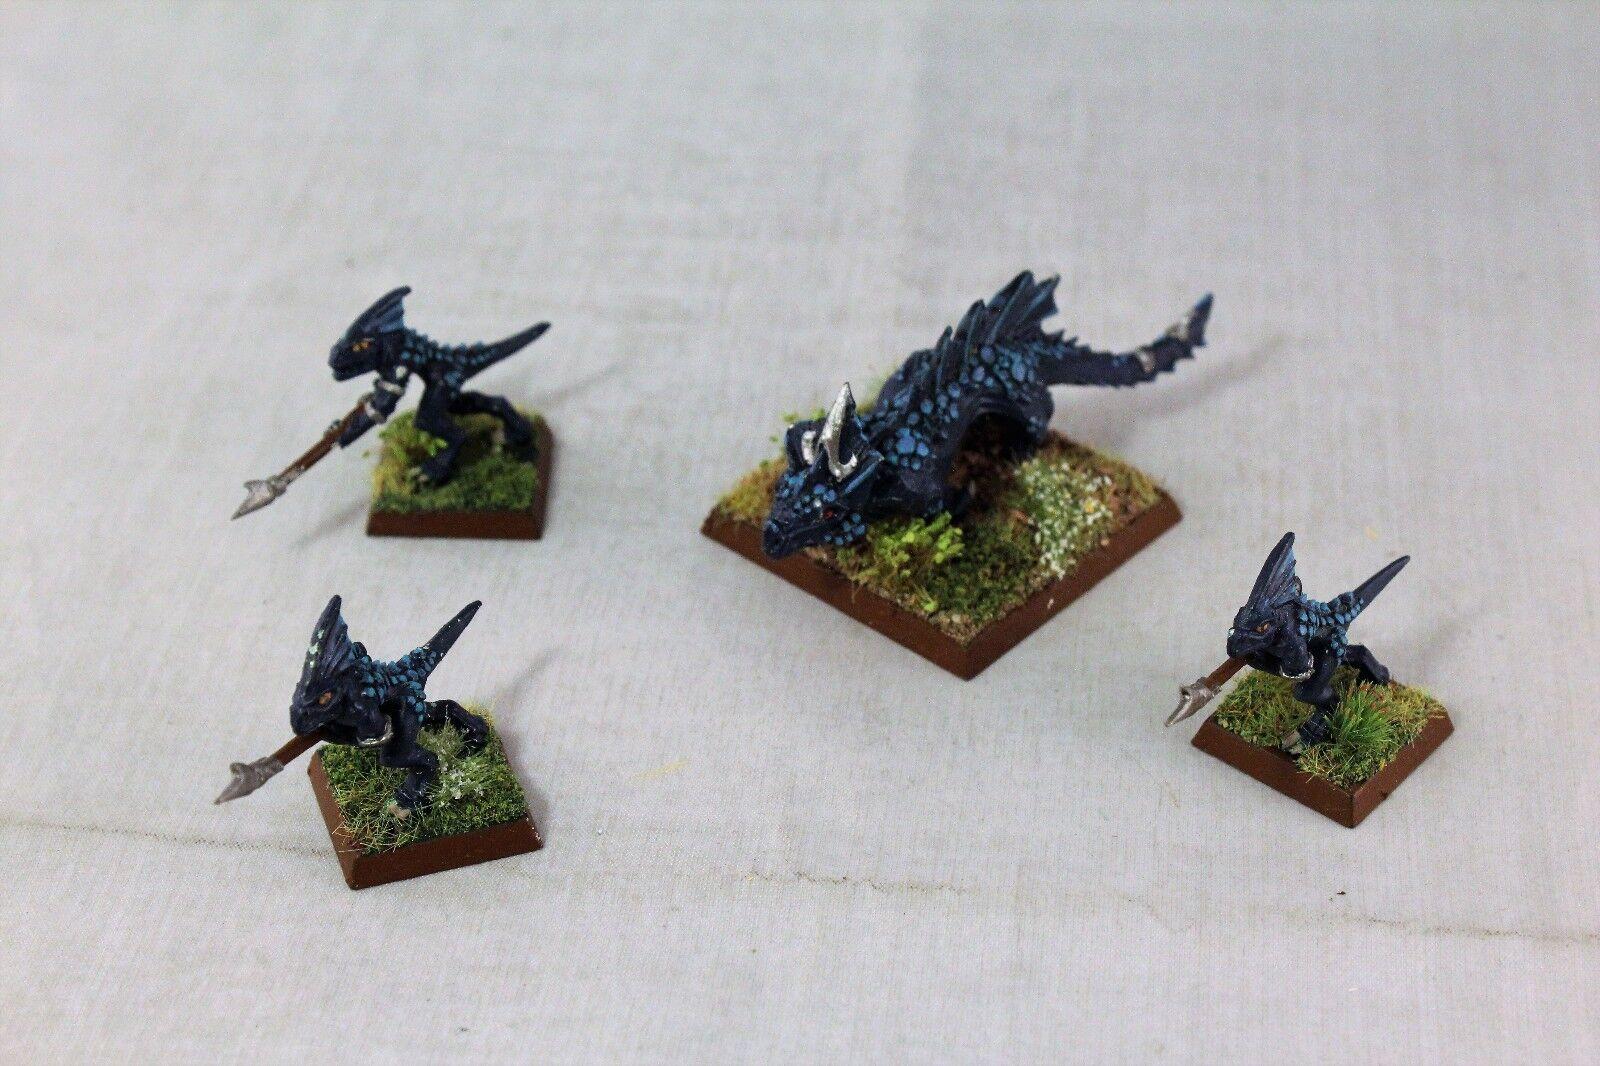 Warhammer Lagarto seraphon Salamandra Pack bien pintados